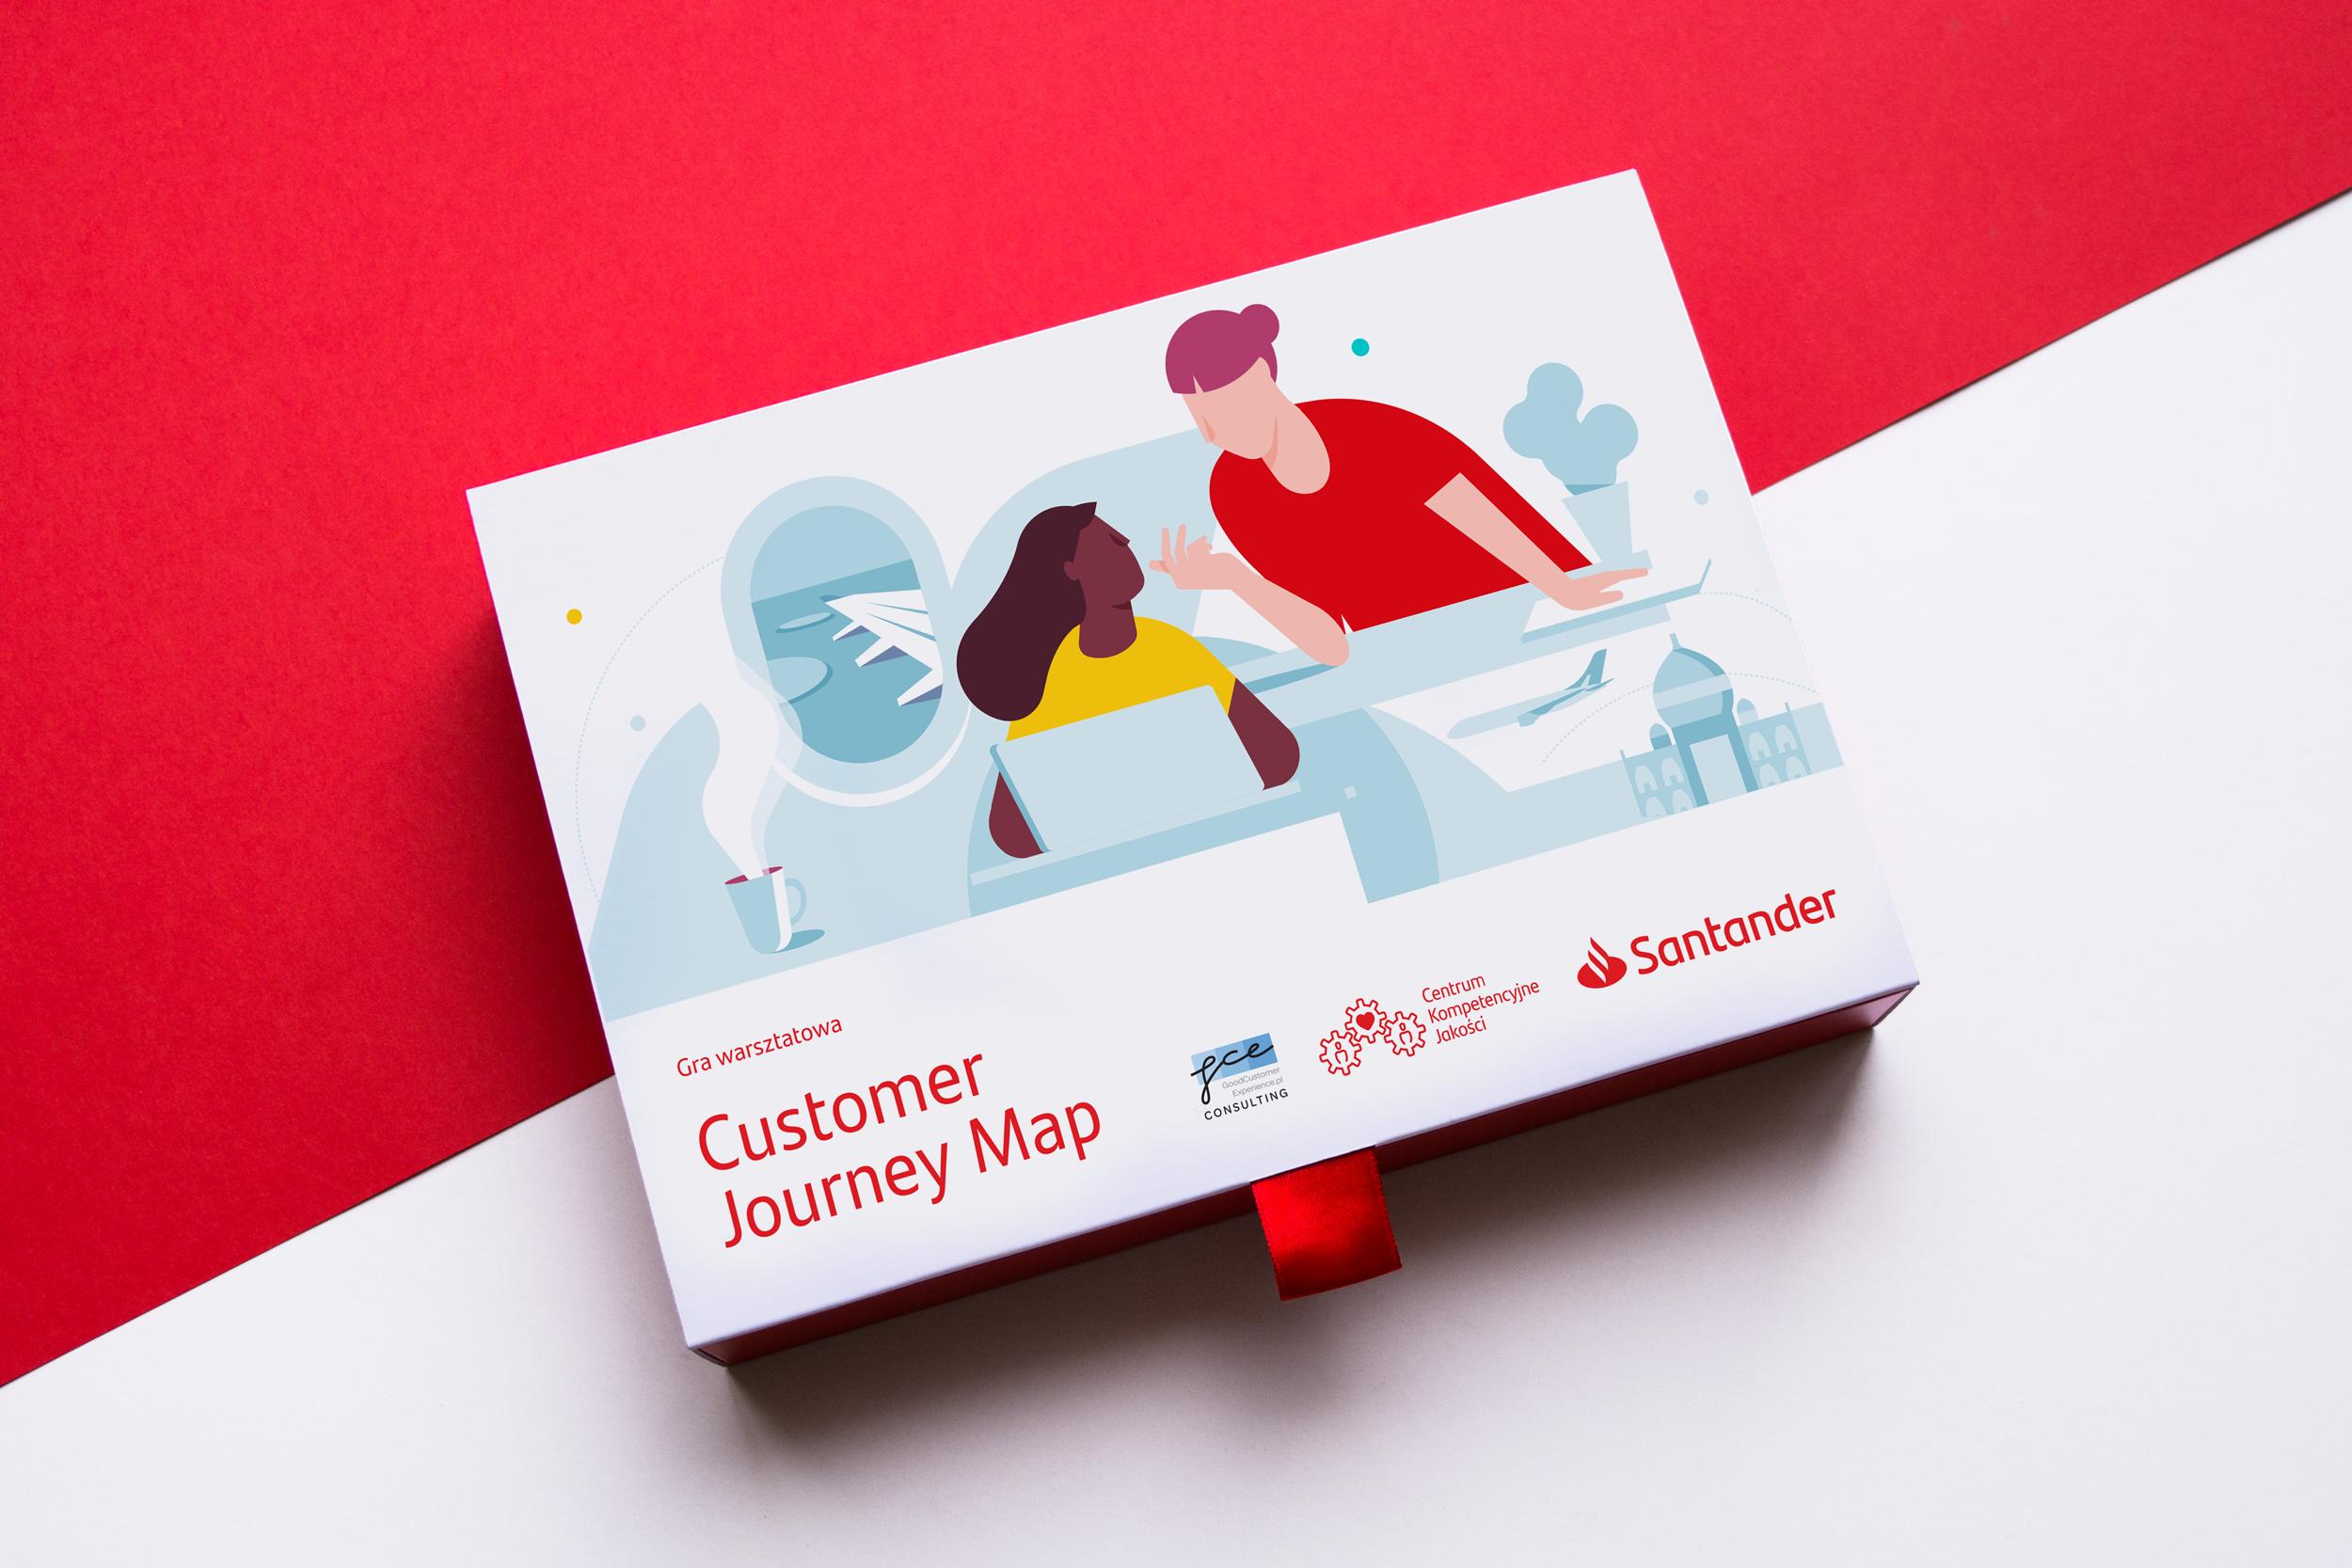 Santander Customer Journey